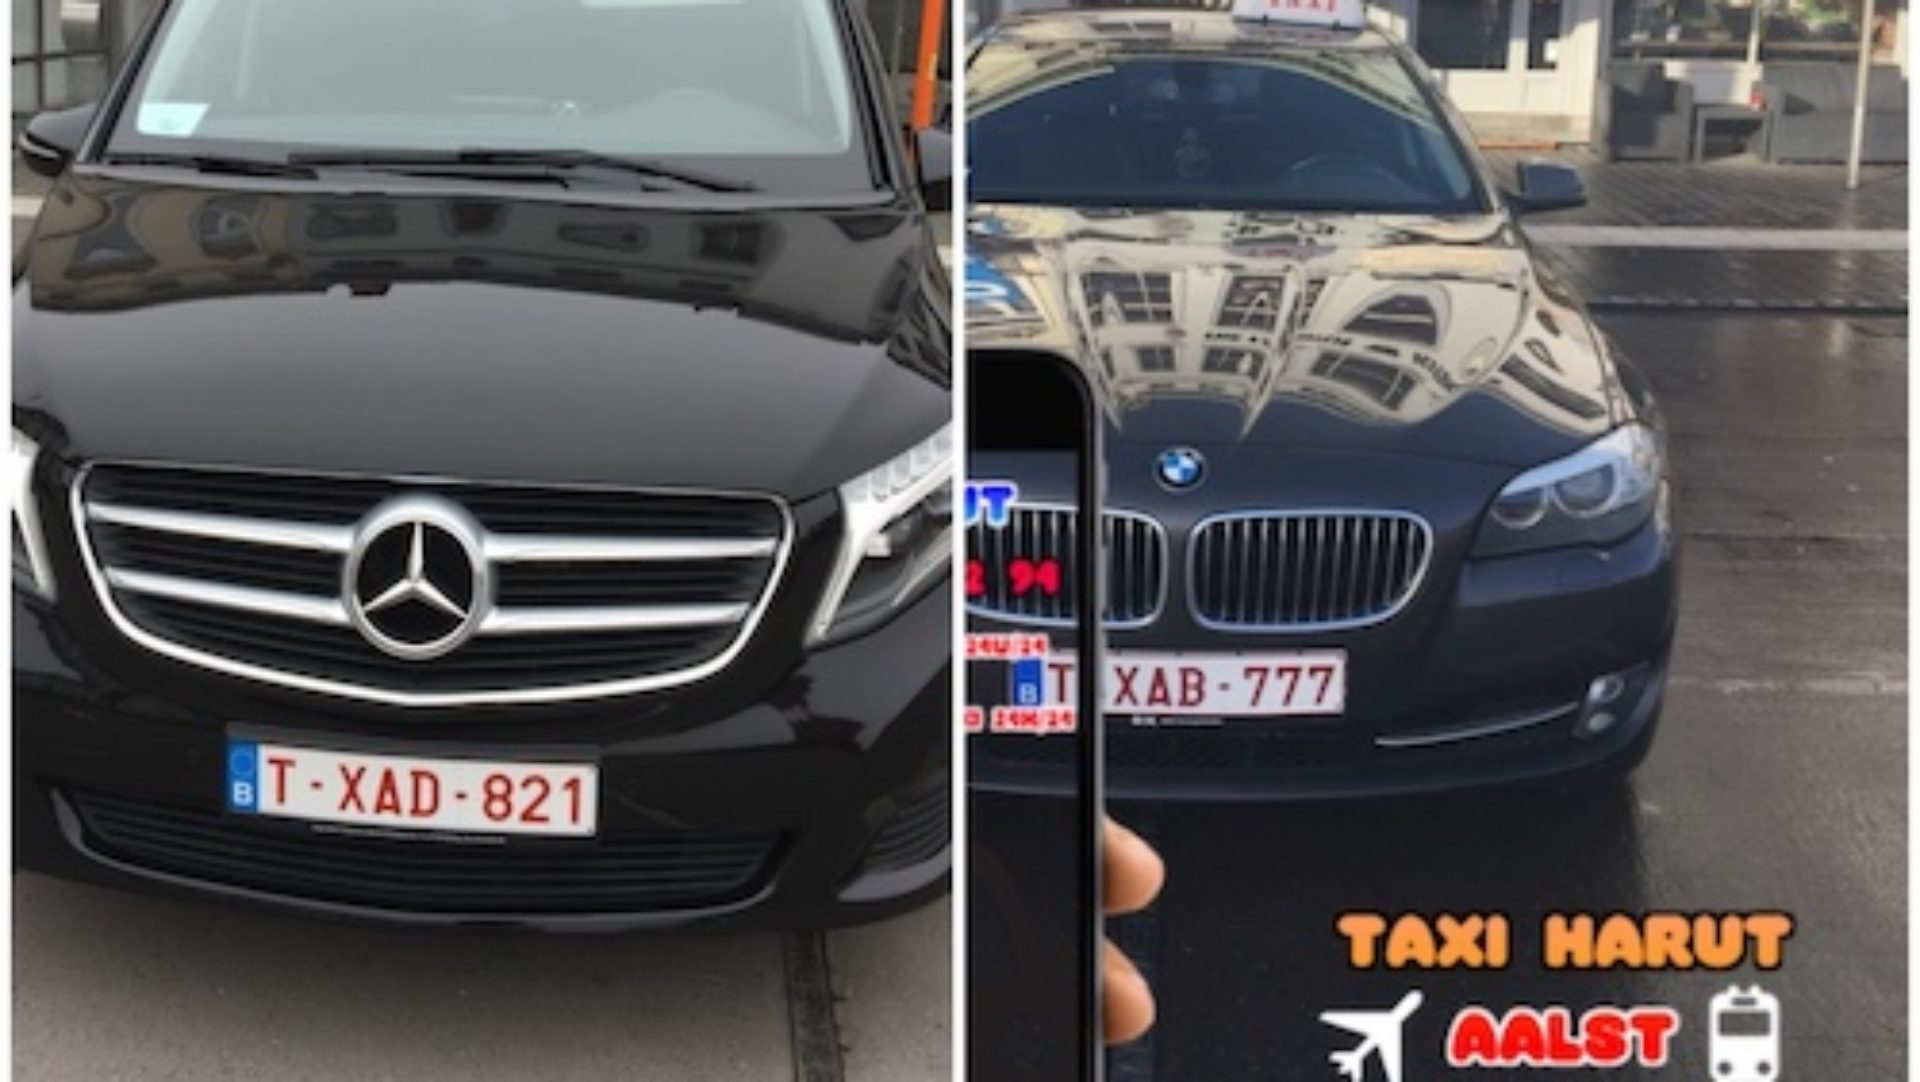 Taxi Harut